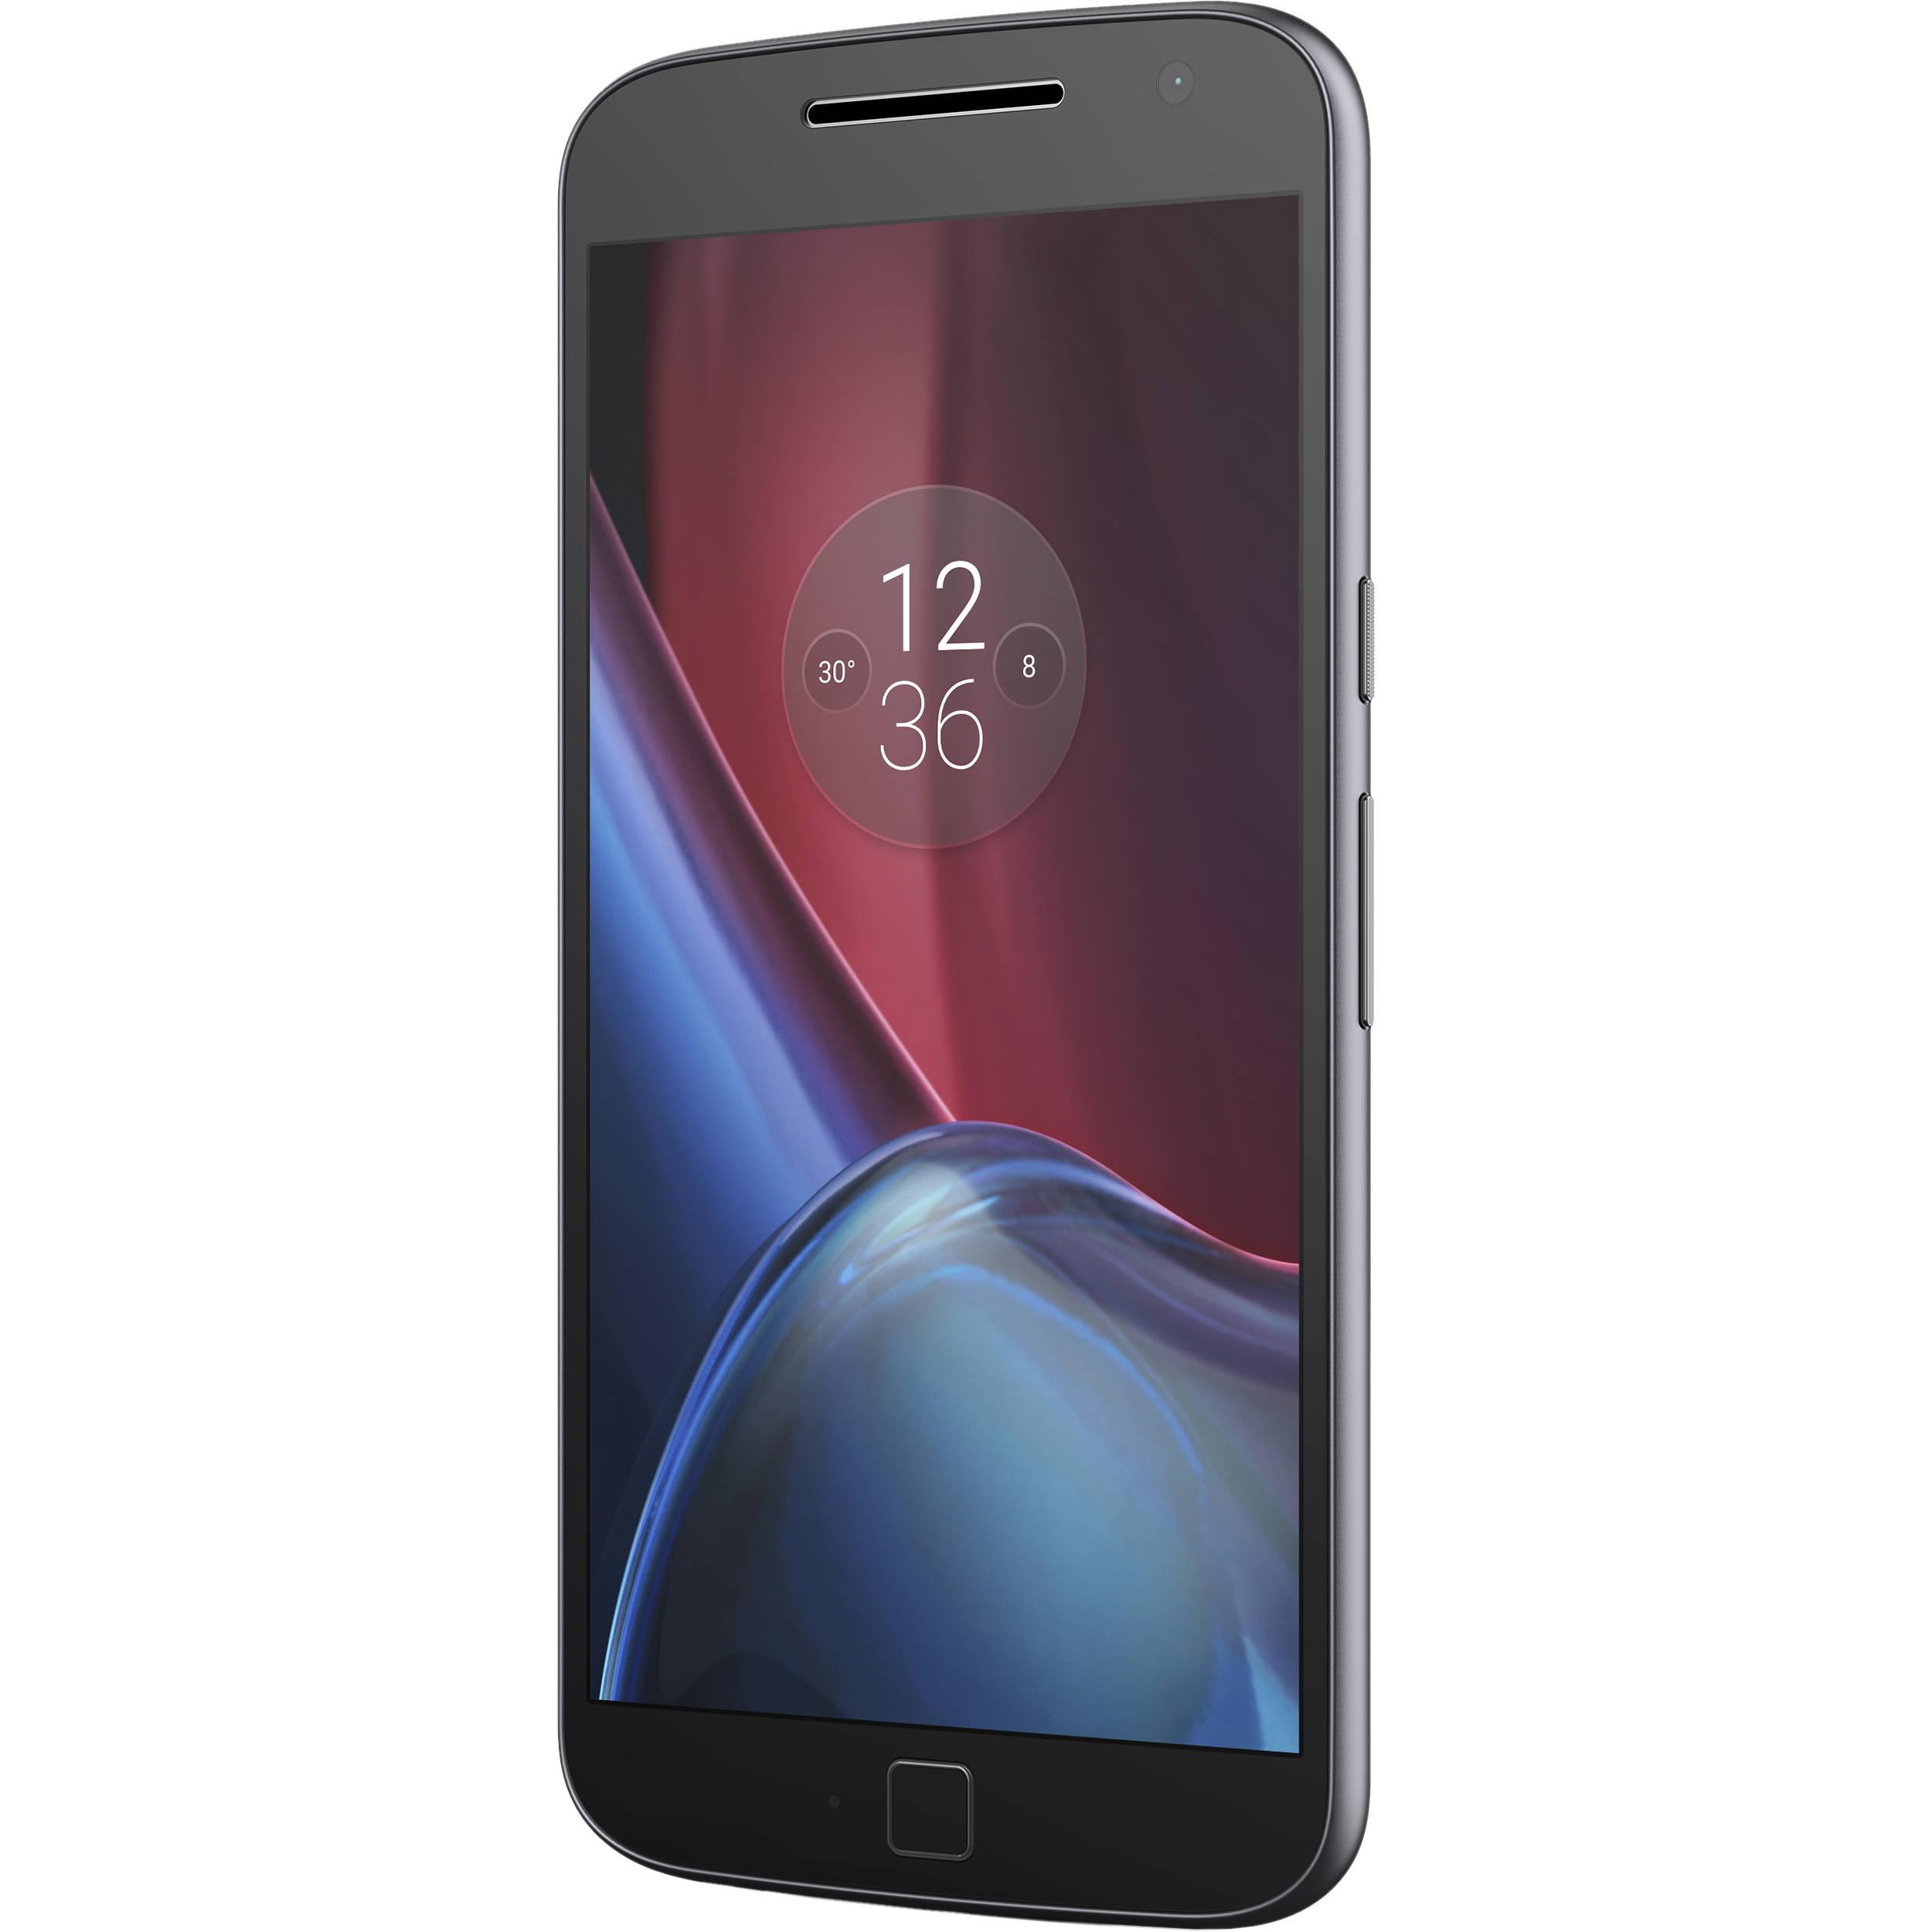 c2af1e067 Used Moto Moto G Plus XT1644 4th Gen. 64GB Smartphone 00967NARTL